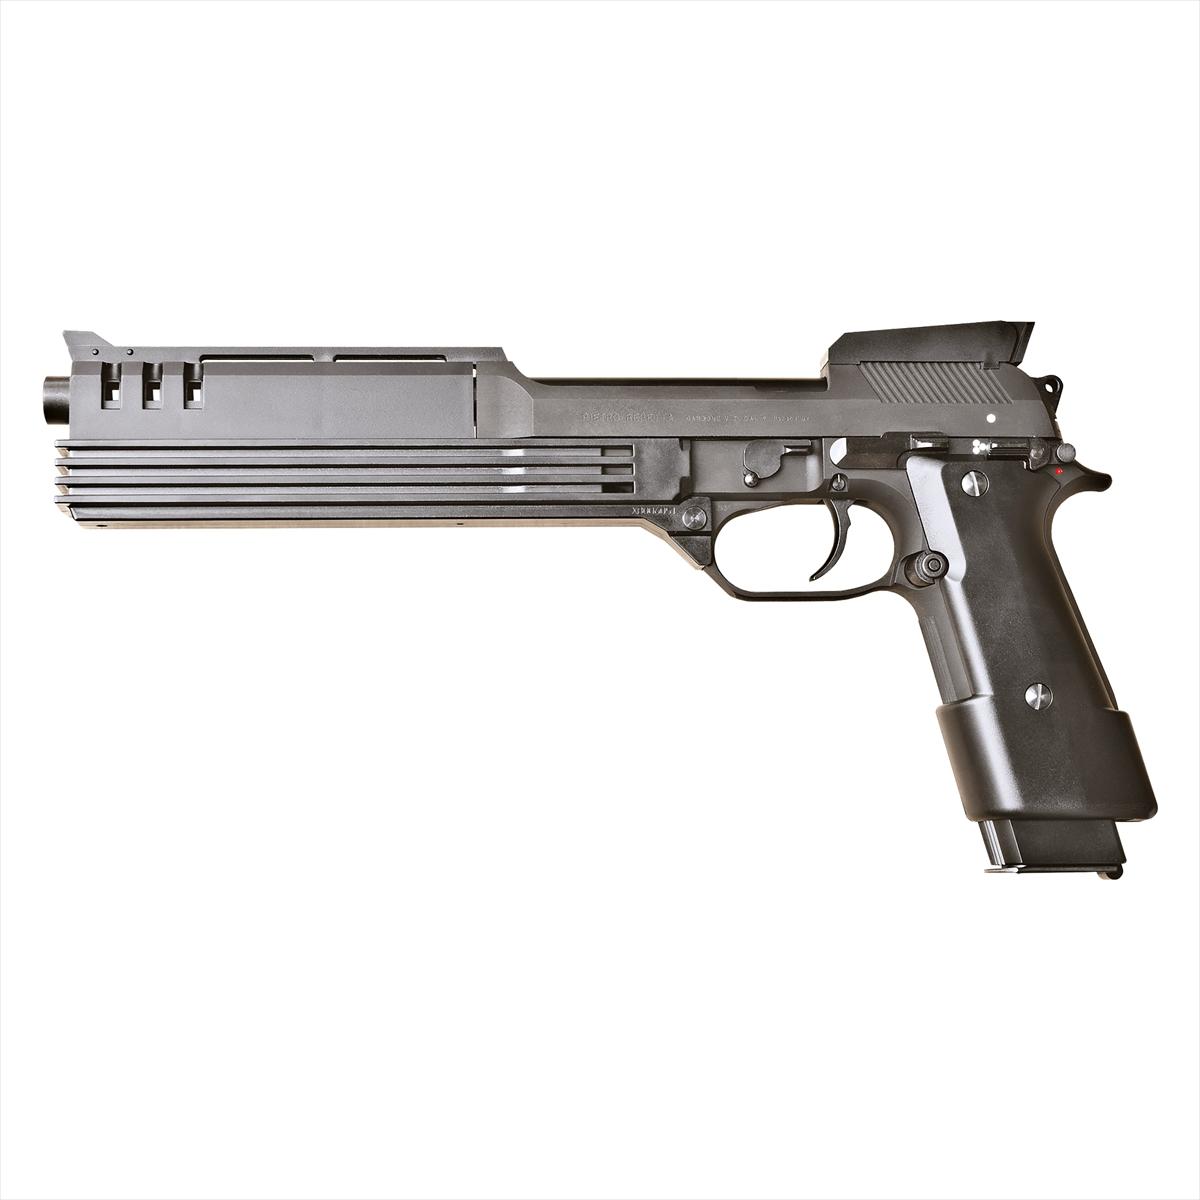 KSC オート9C HW ガスガン エアガン ガスブローバック 銃 6mmBB 18歳以上 019370